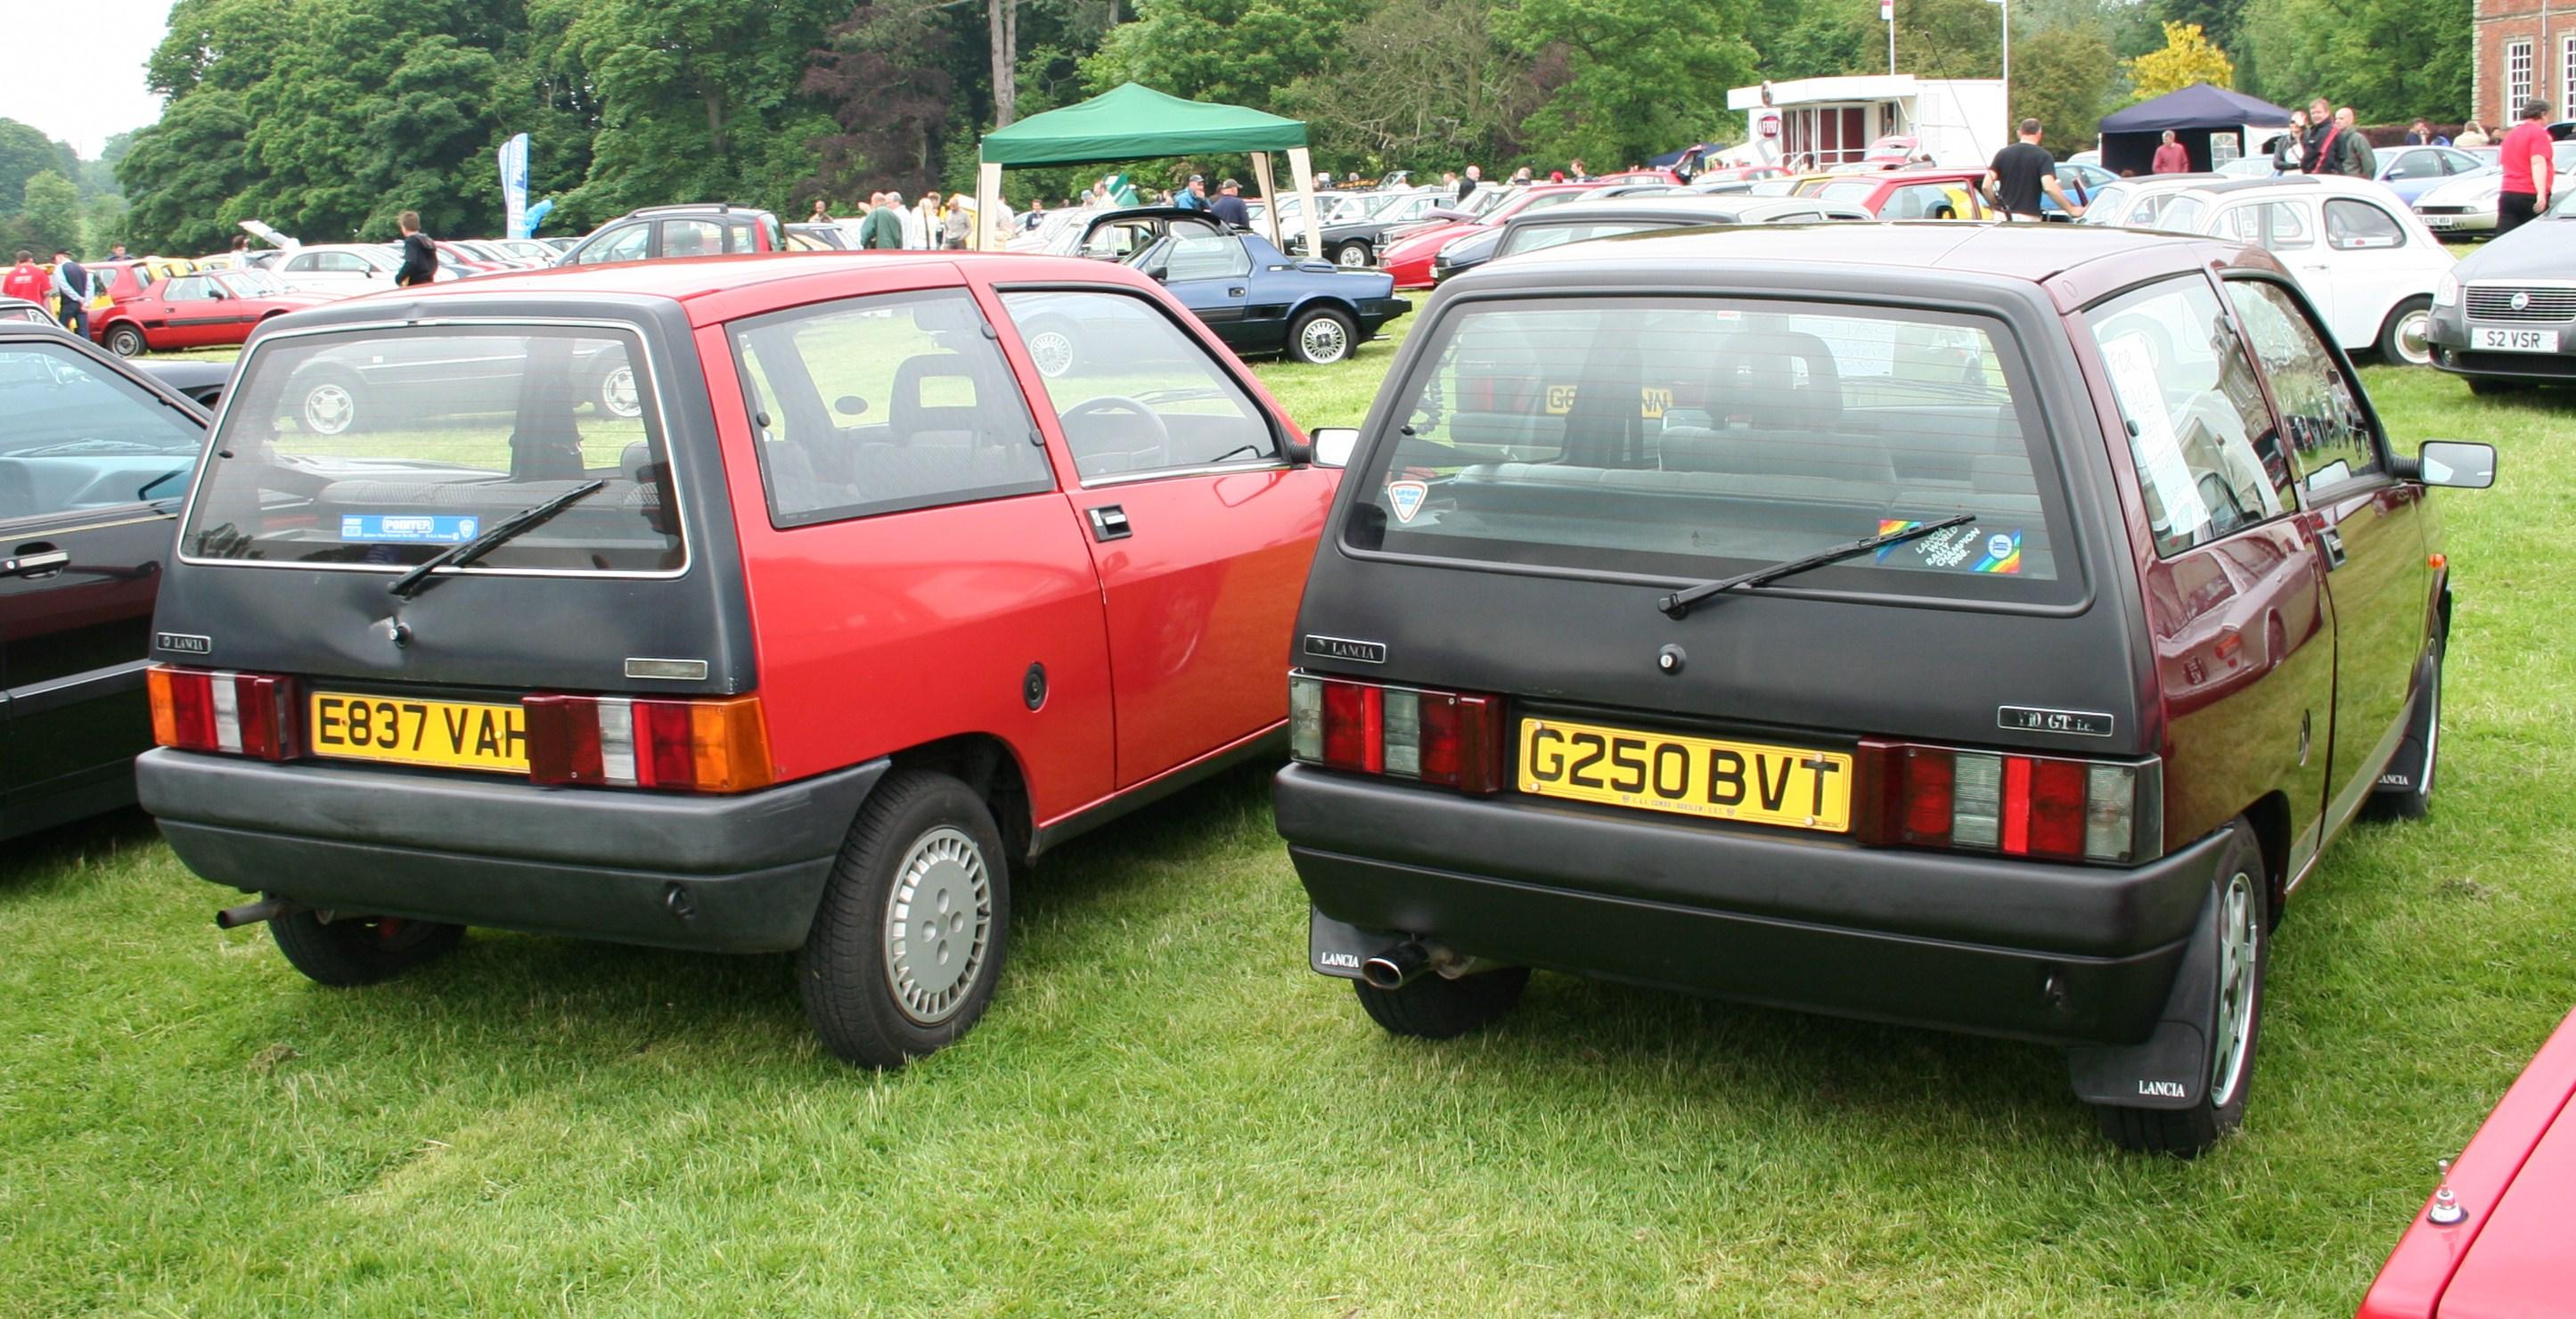 http://carsot.com/images/lancia-y10-1985-1995-hatchback-3-door-exterior-3.jpg